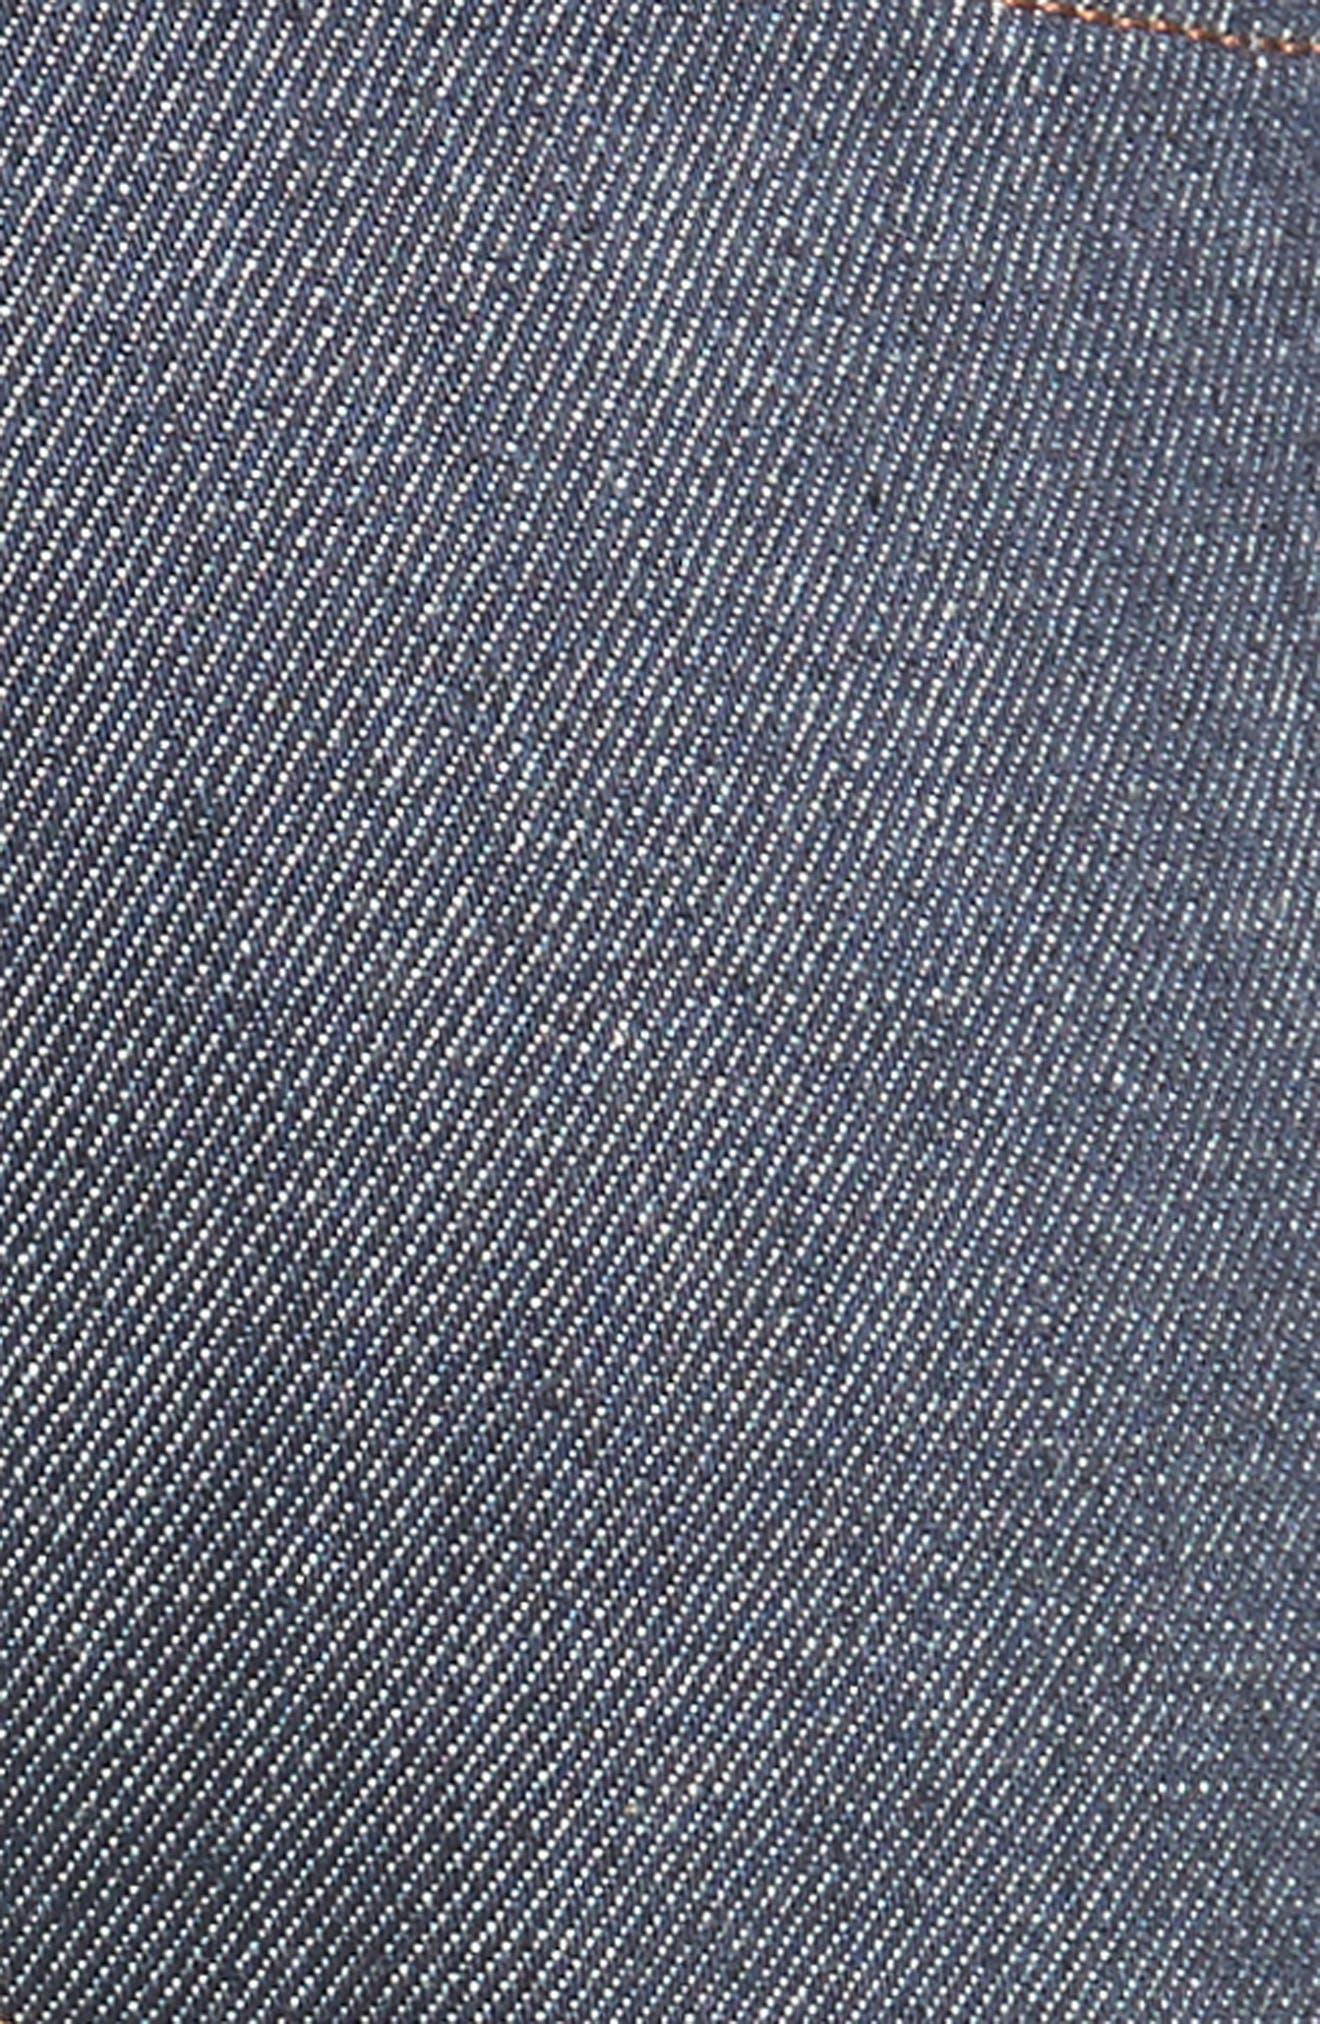 River Slim Tapered Leg Jeans,                             Alternate thumbnail 5, color,                             INDIGO